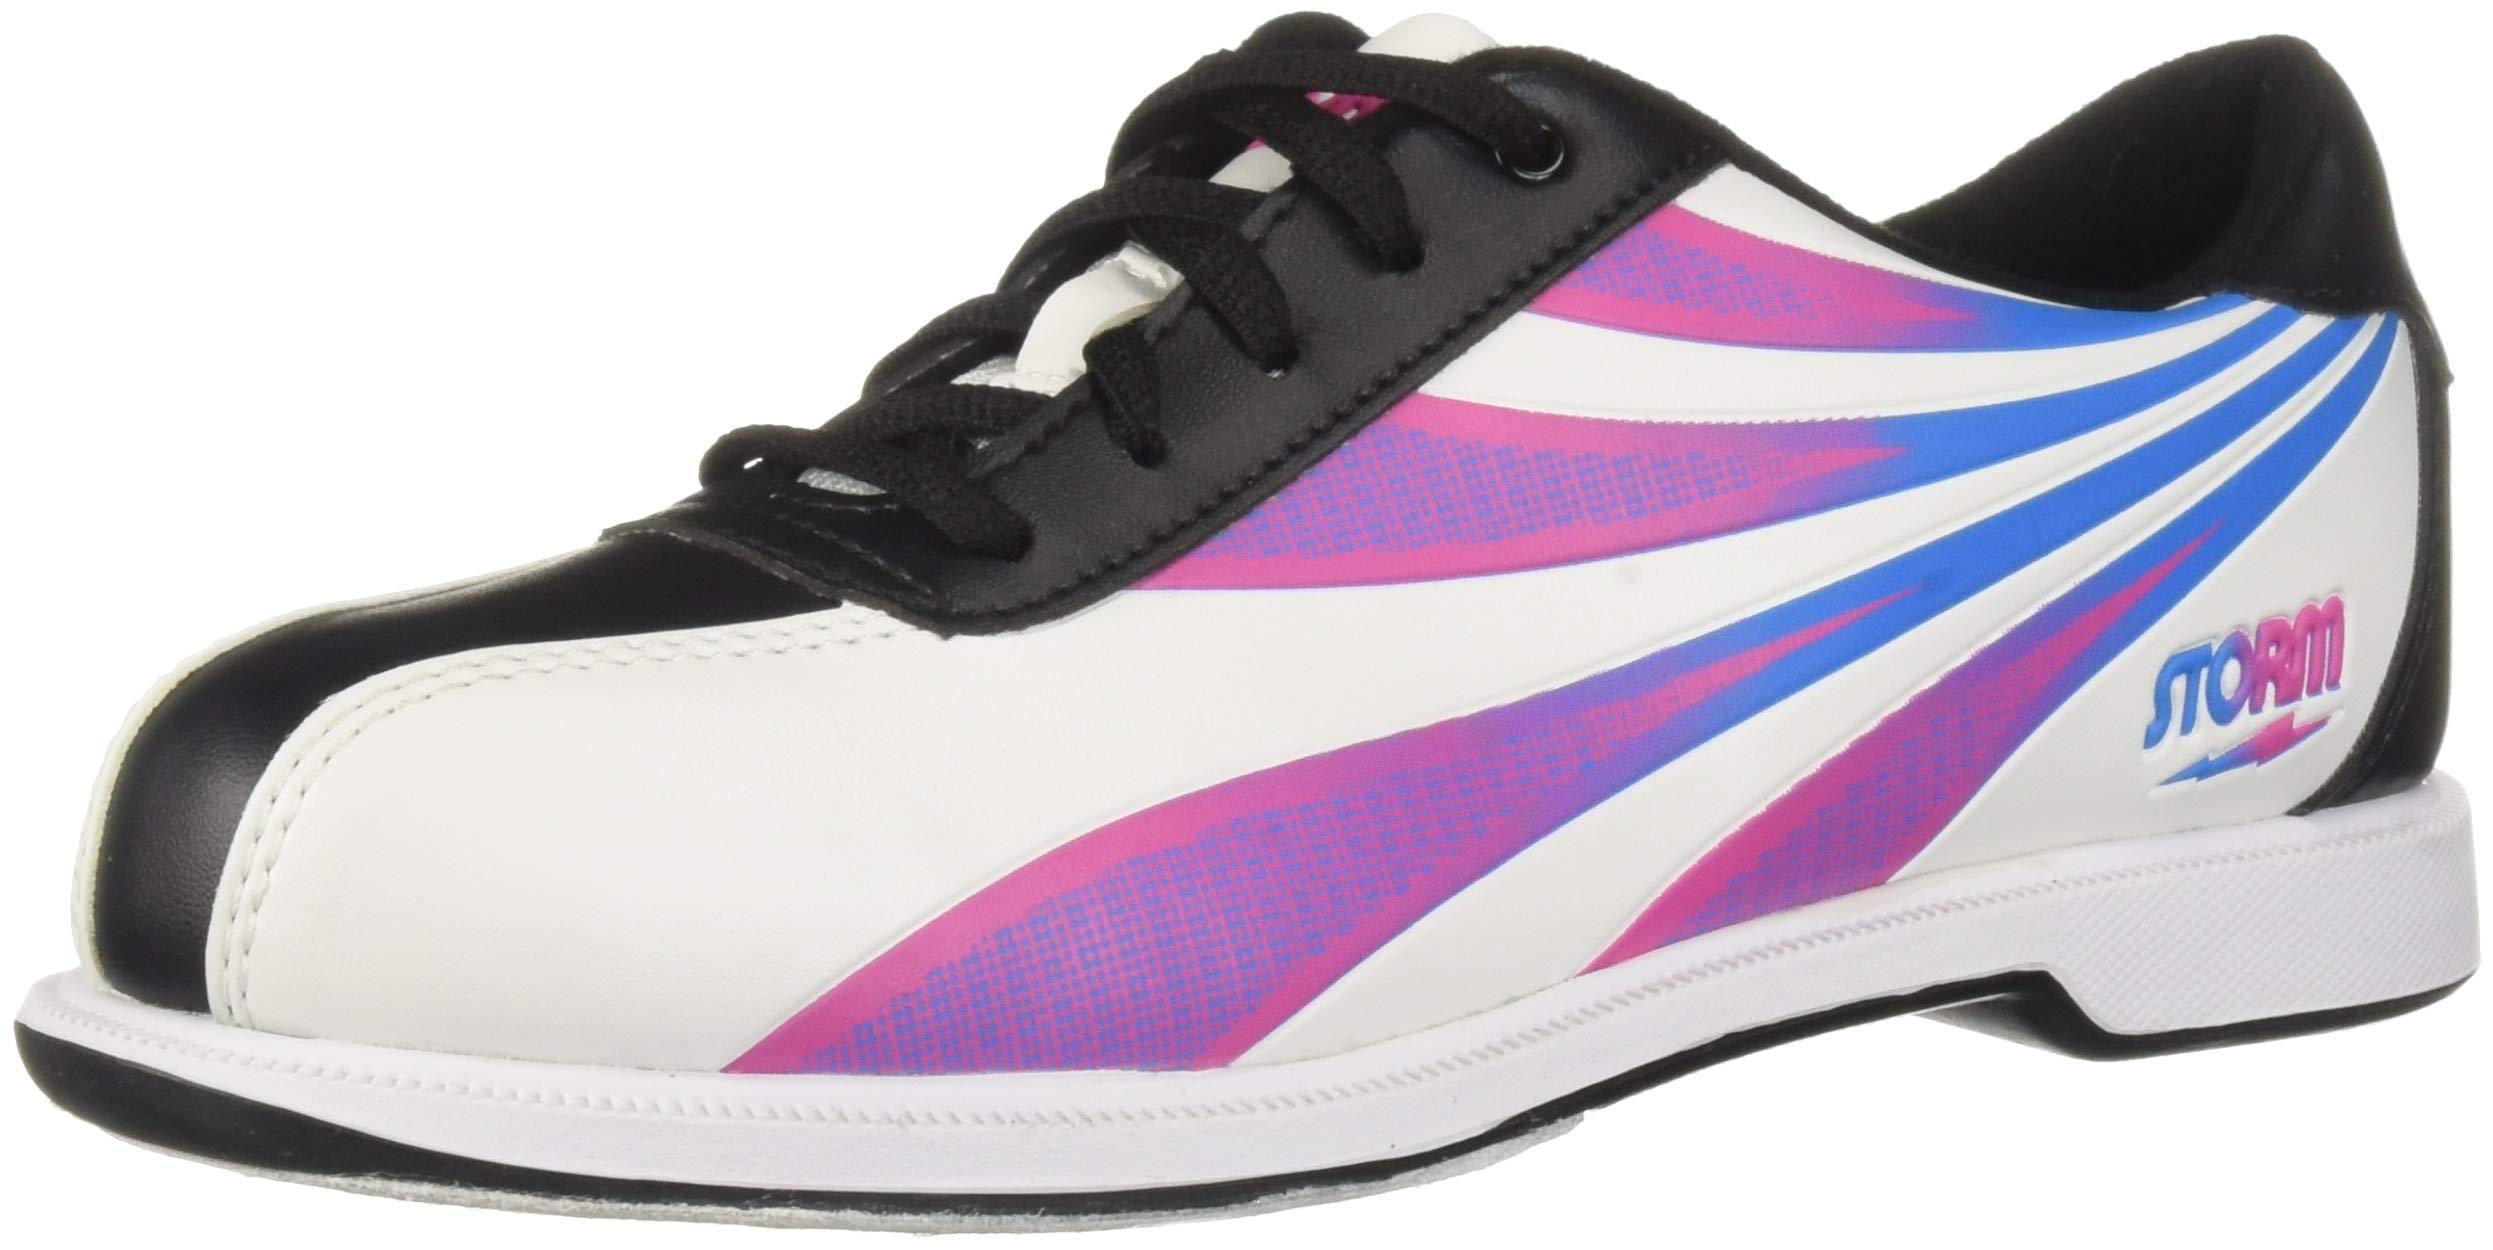 Storm Skye Women's Bowling Shoes, White/Black, 9.5 by Storm